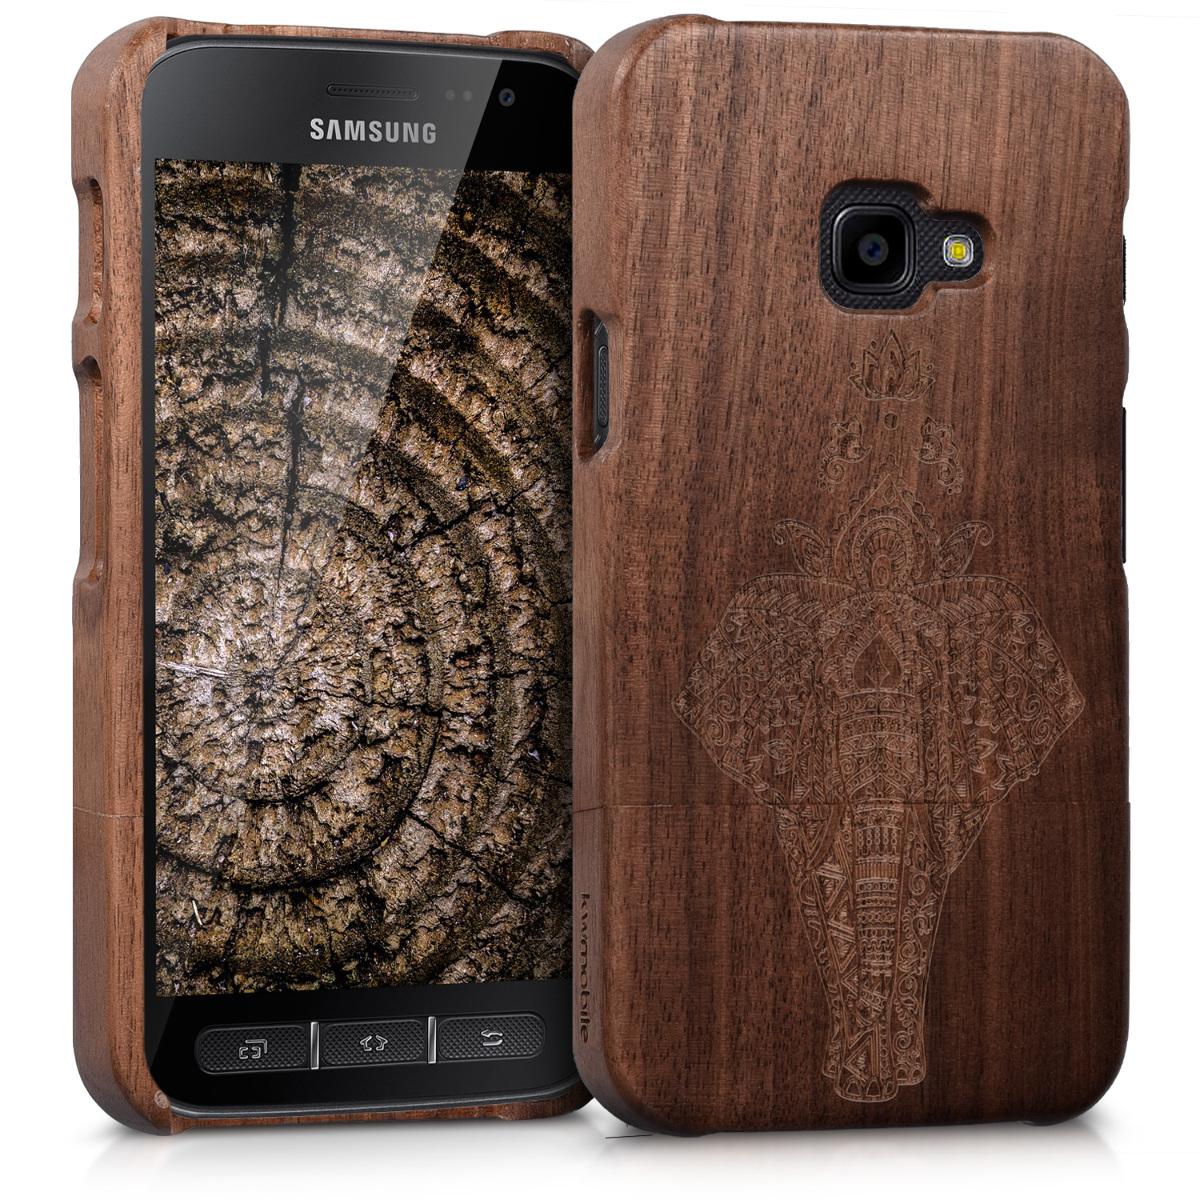 KW Σκληρή Ξύλινη θήκη Samsung Galaxy Xcover 4 - Brown (42147.01)